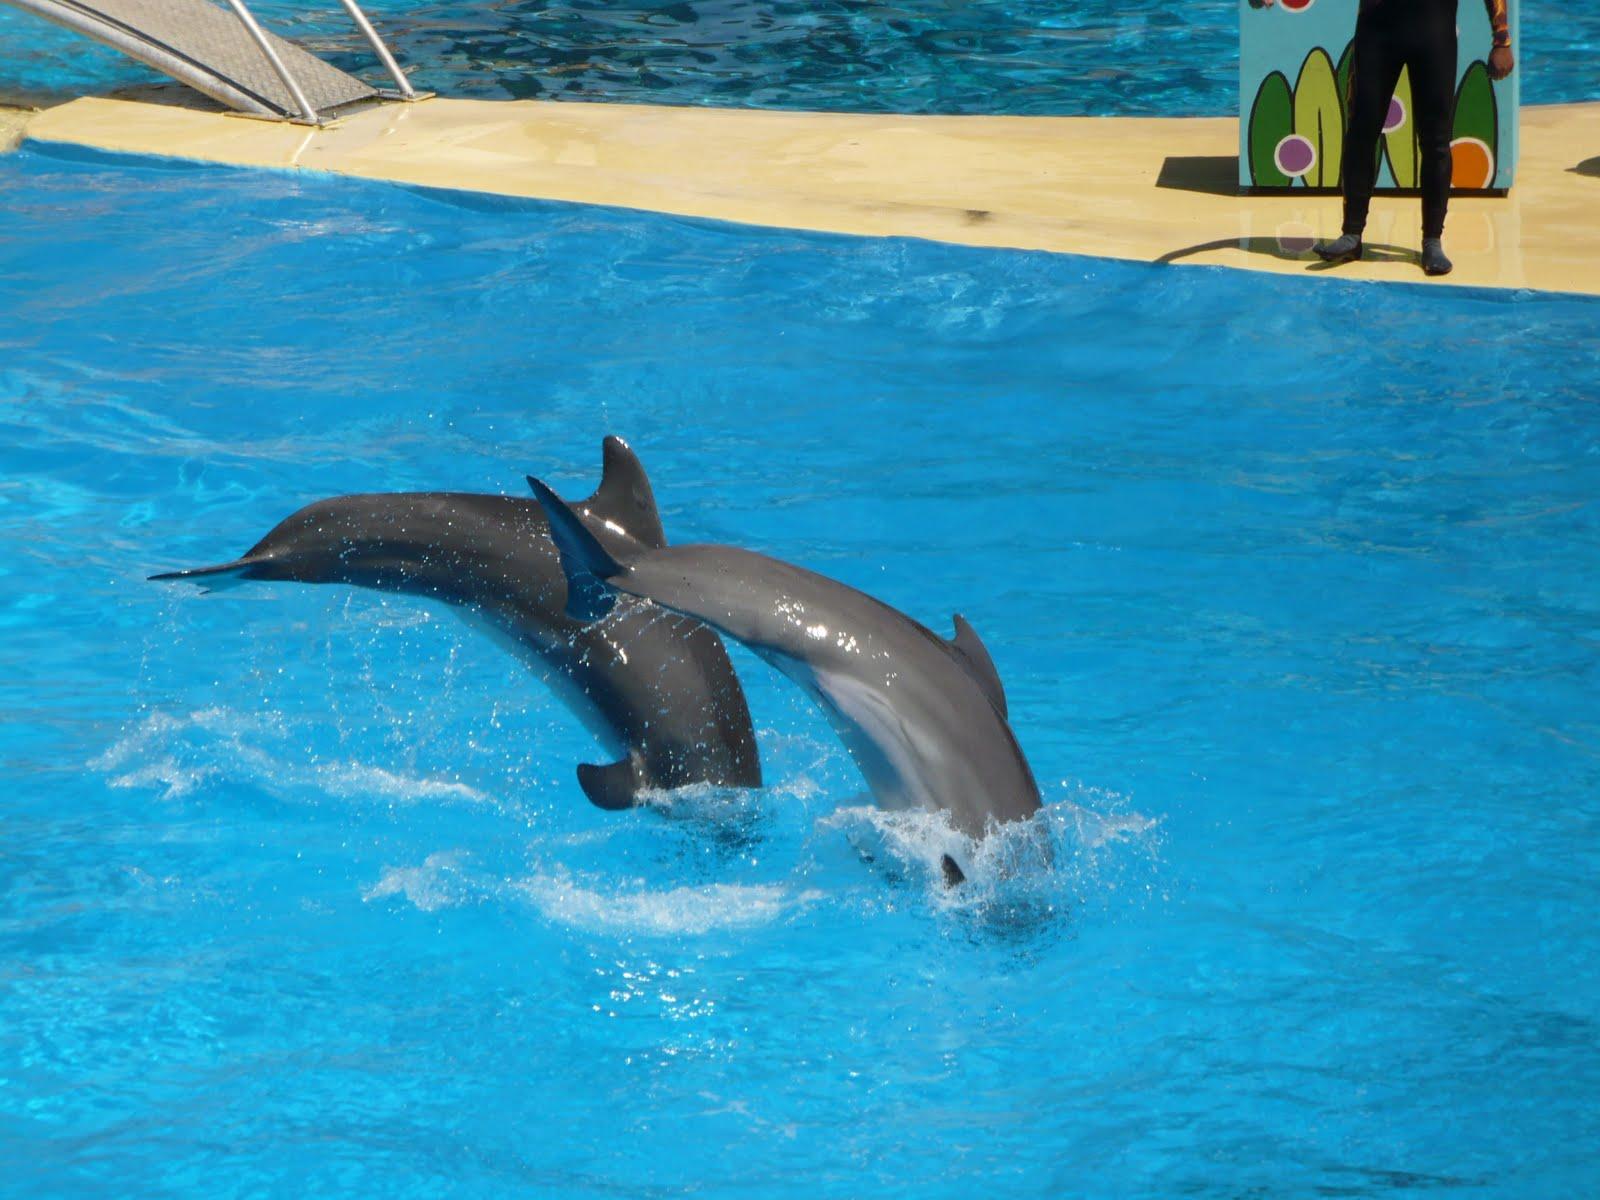 Code promo marineland rencontre avec les dauphins